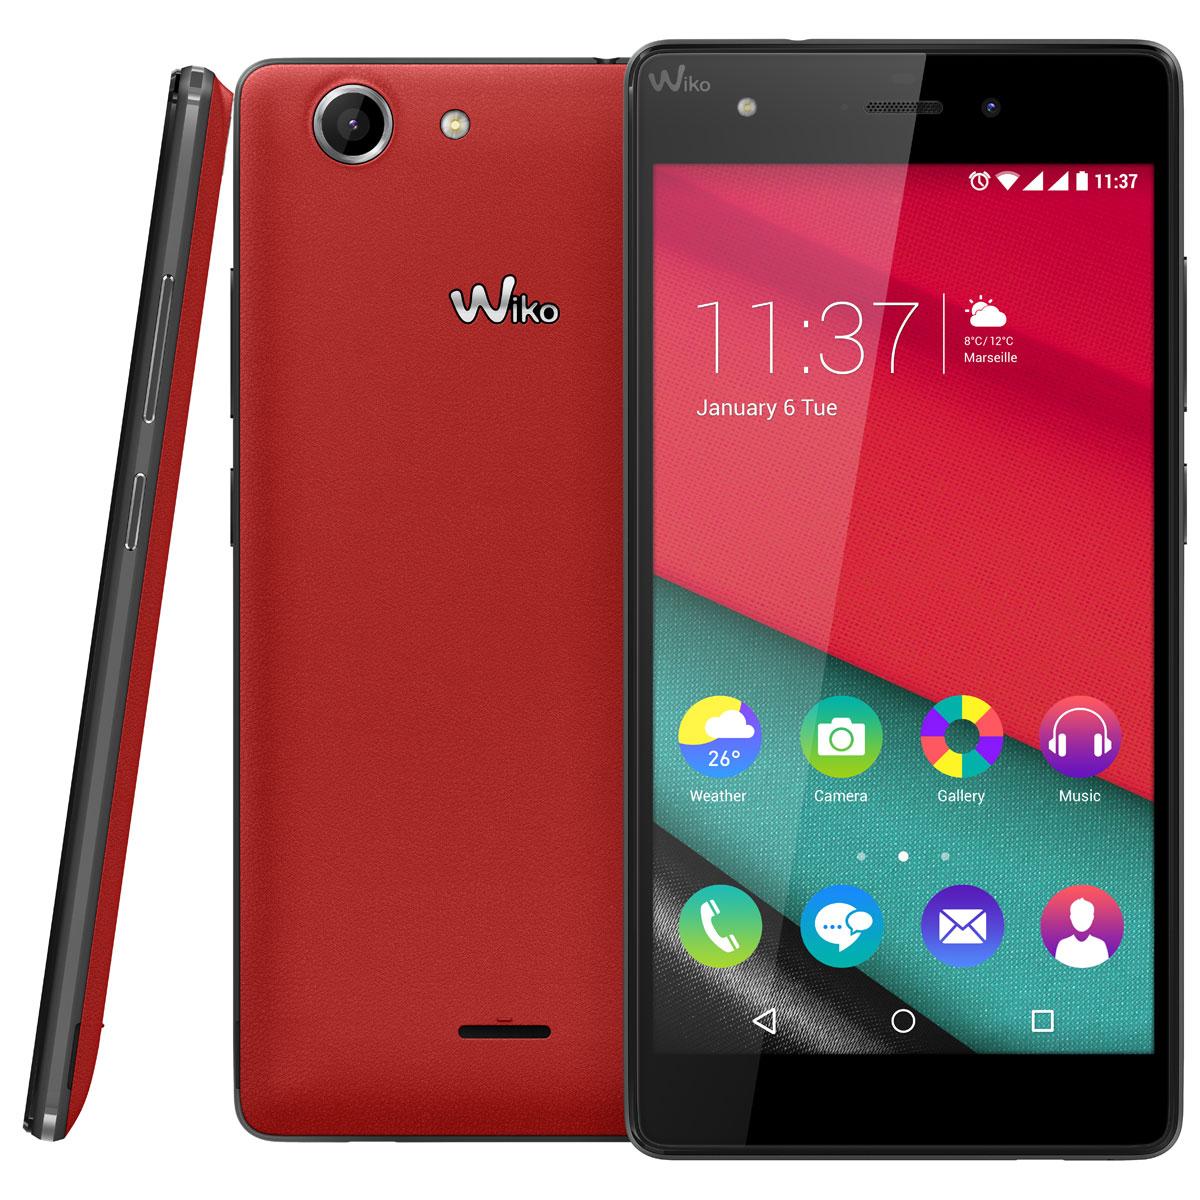 wiko pulp 4g rouge mobile smartphone wiko sur ldlc. Black Bedroom Furniture Sets. Home Design Ideas